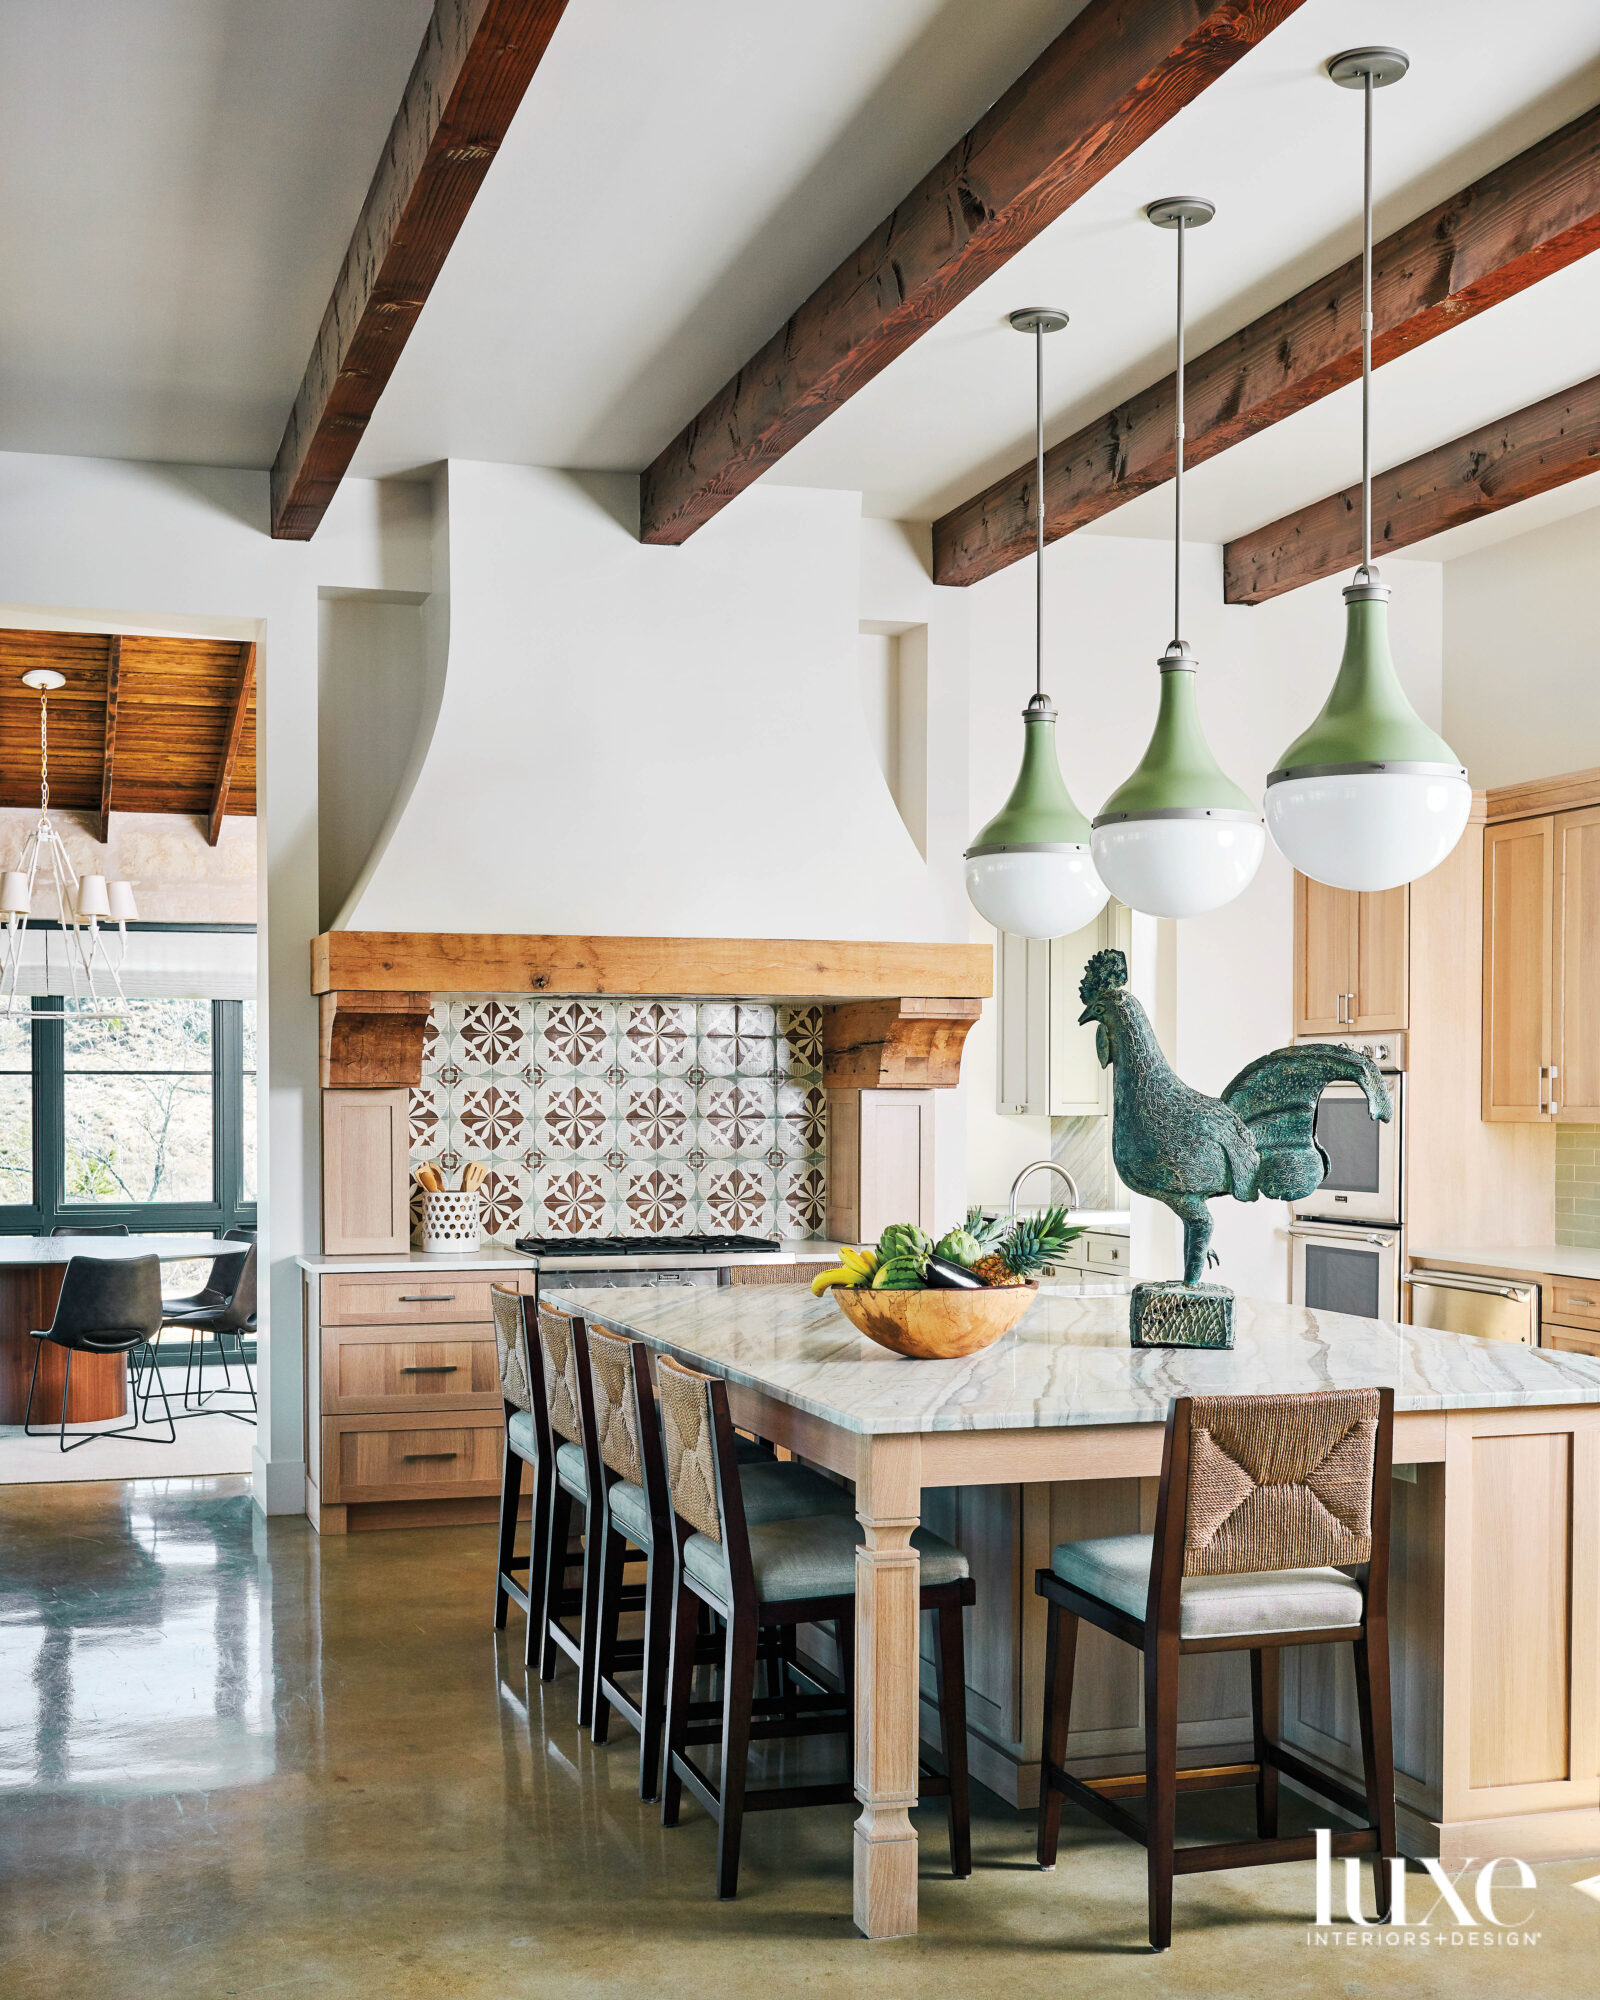 Kitchen with statement backsplash and vent hood.